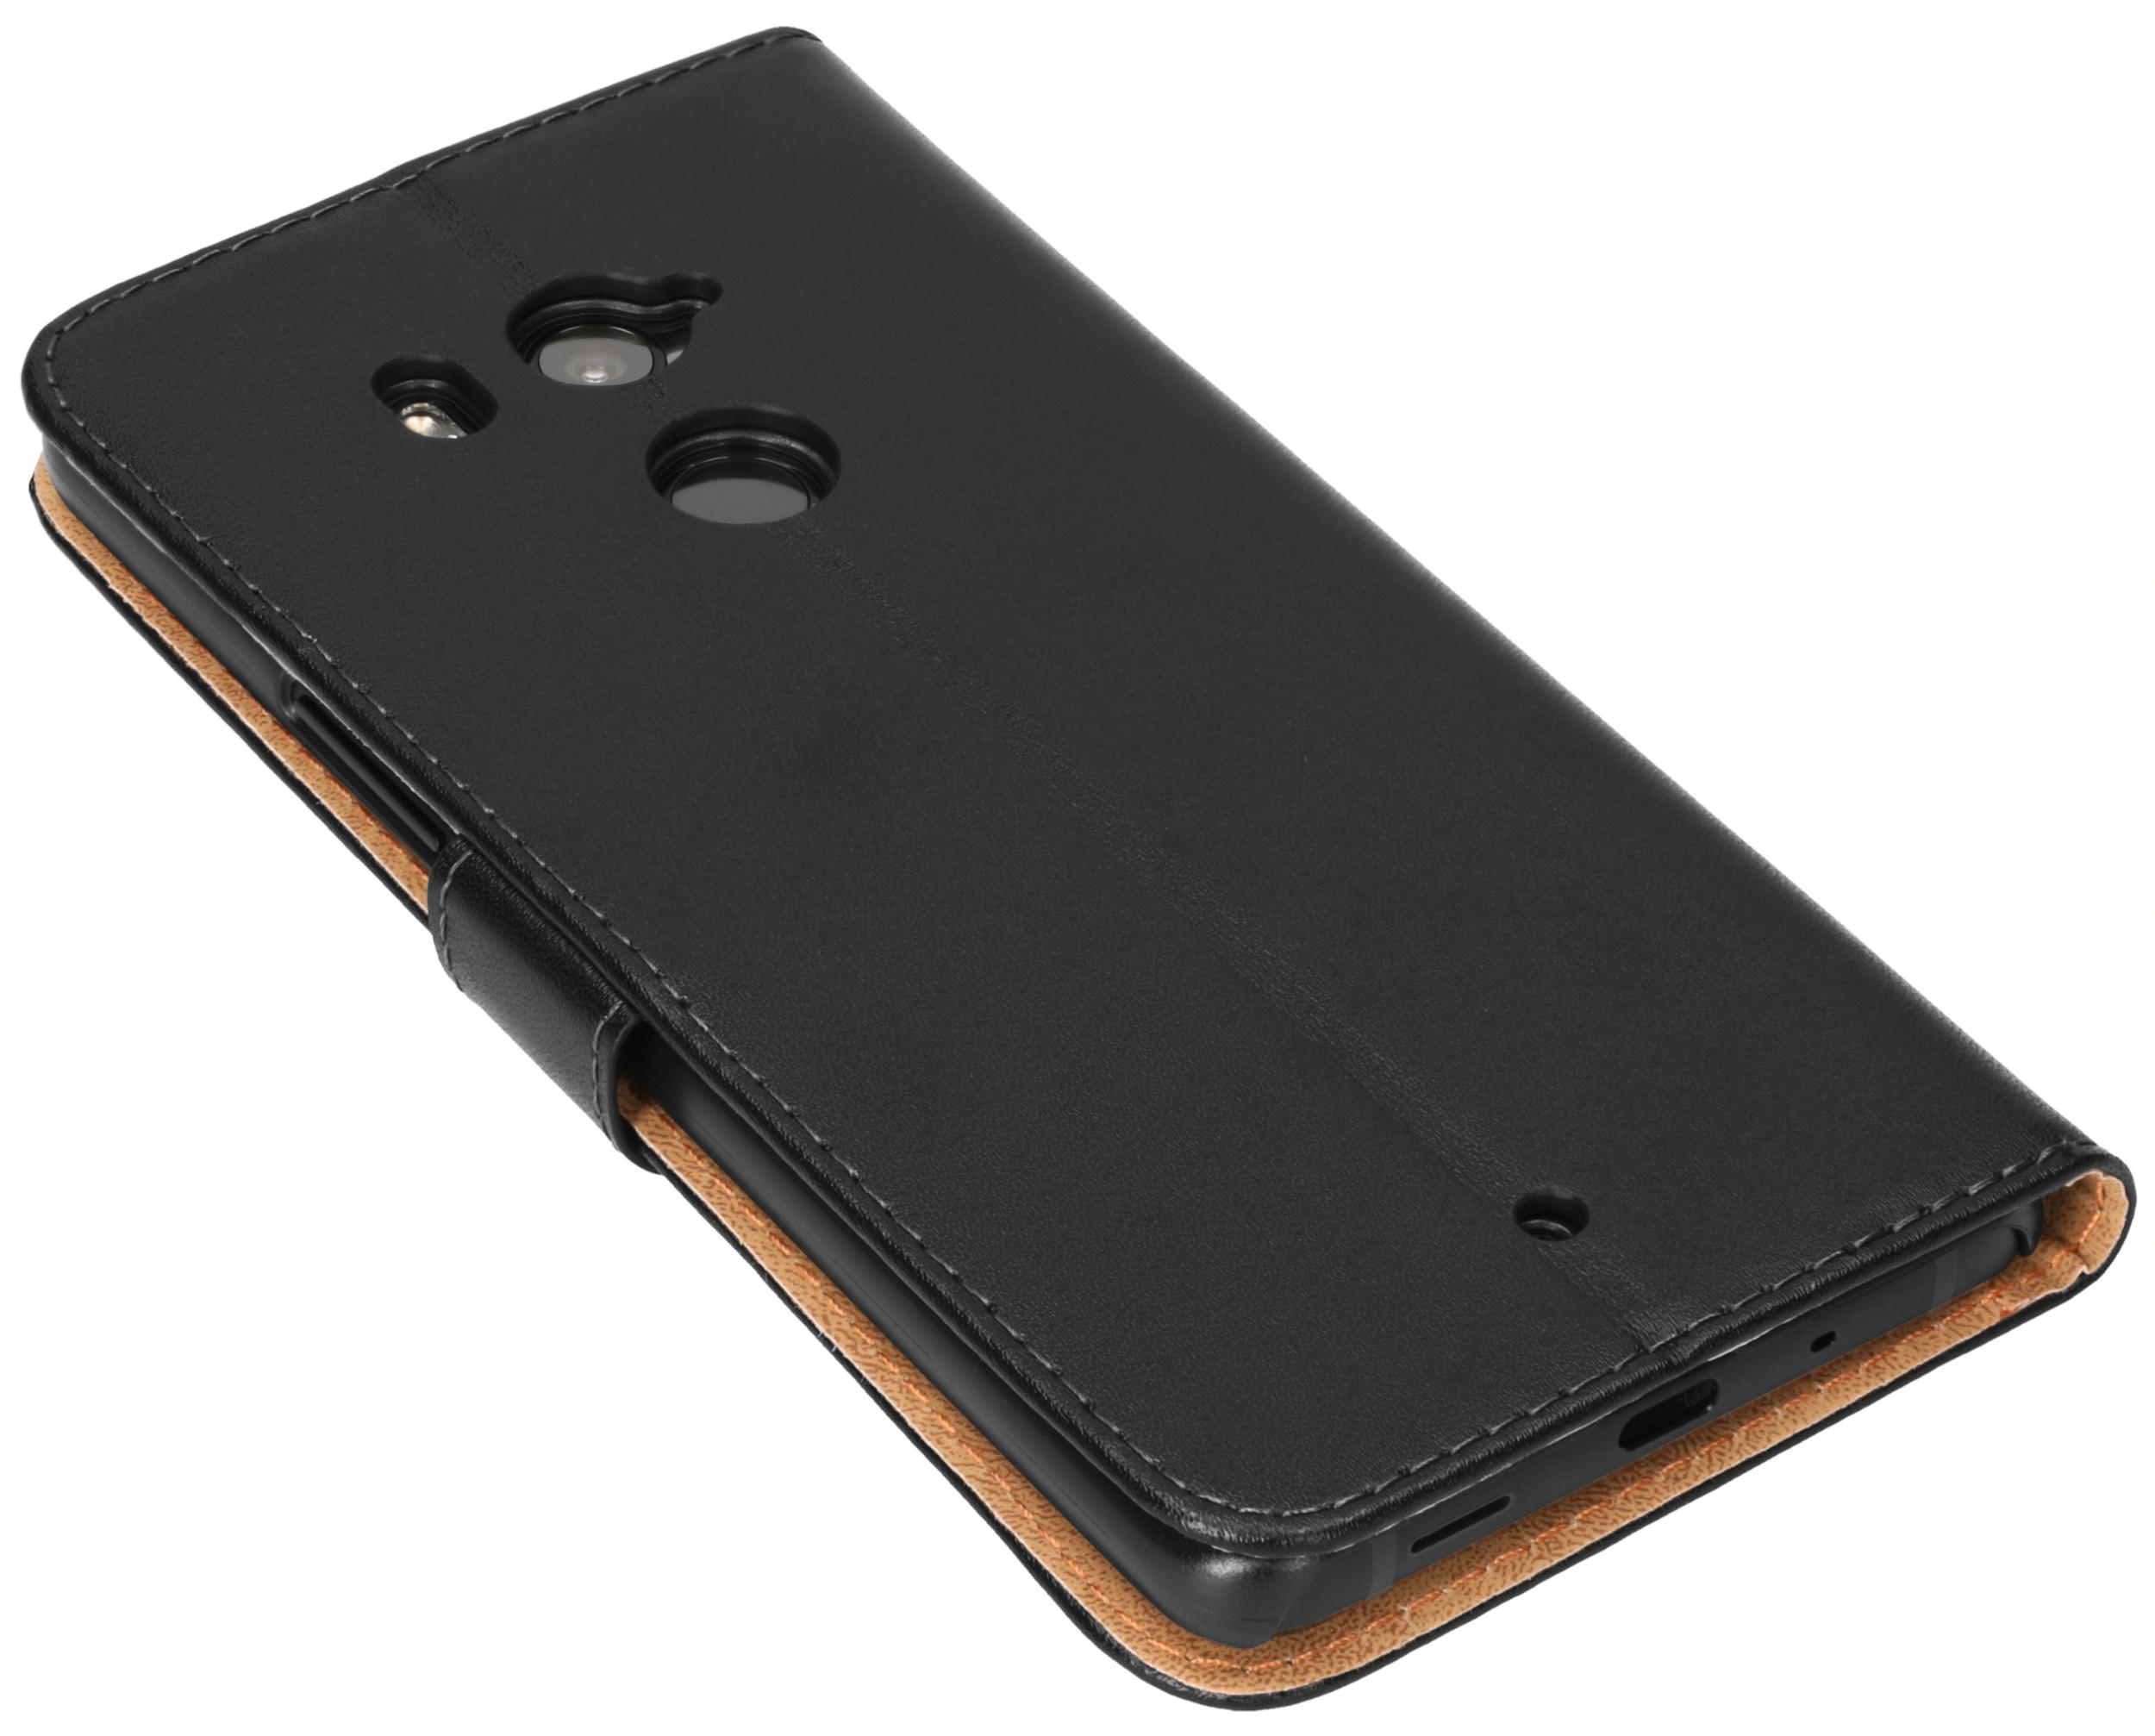 mumbi-PU-Leder-Tasche-fuer-HTC-U11-Plus-Huelle-Schutzhuelle-Wallet-Etui-Case-Cover